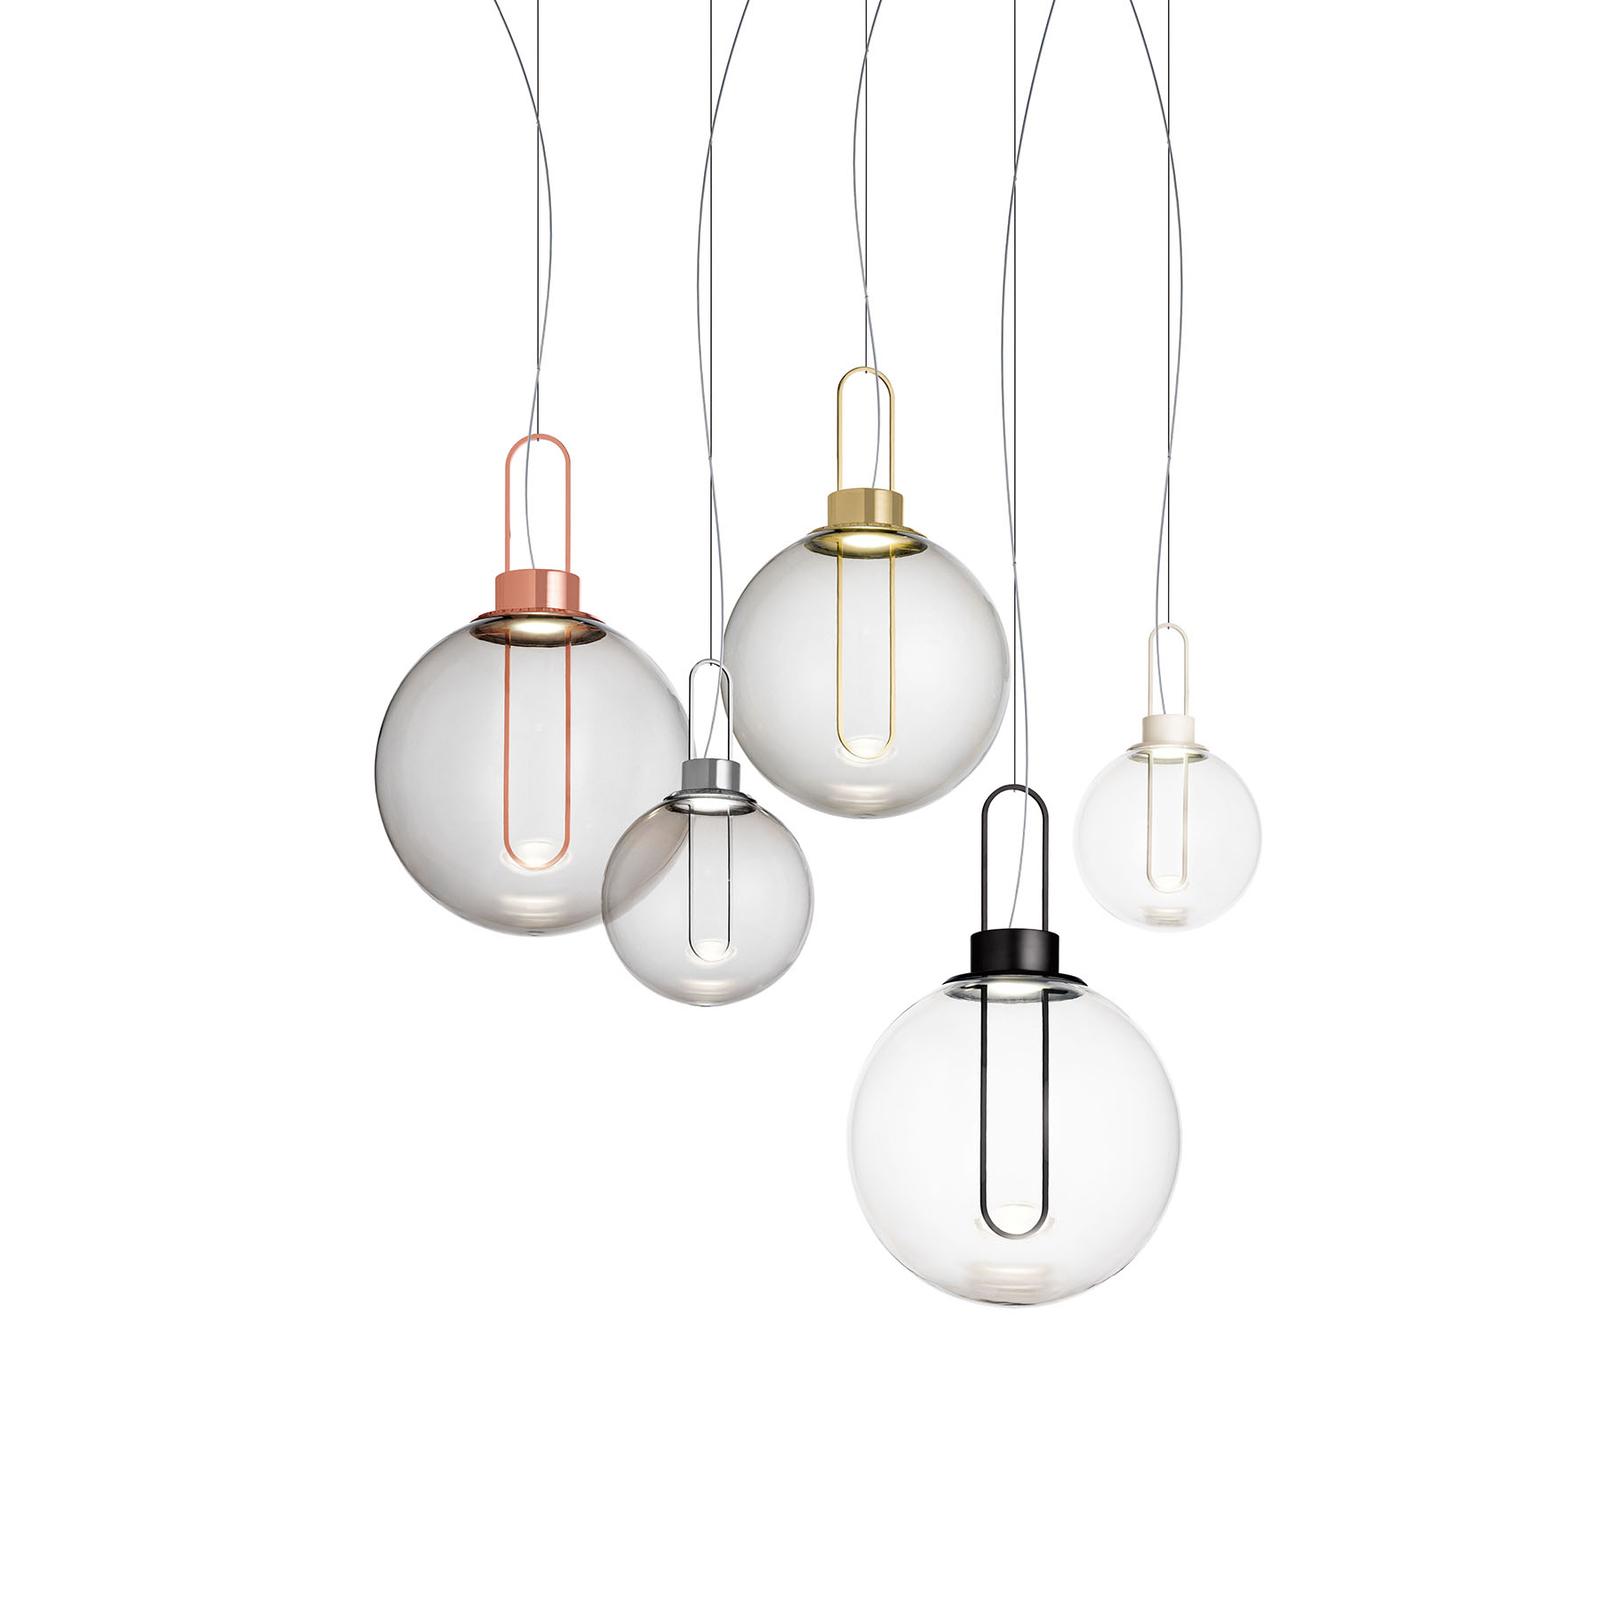 Modo Luce Orb LED-riippuvalaisin, kupari, Ø 40 cm